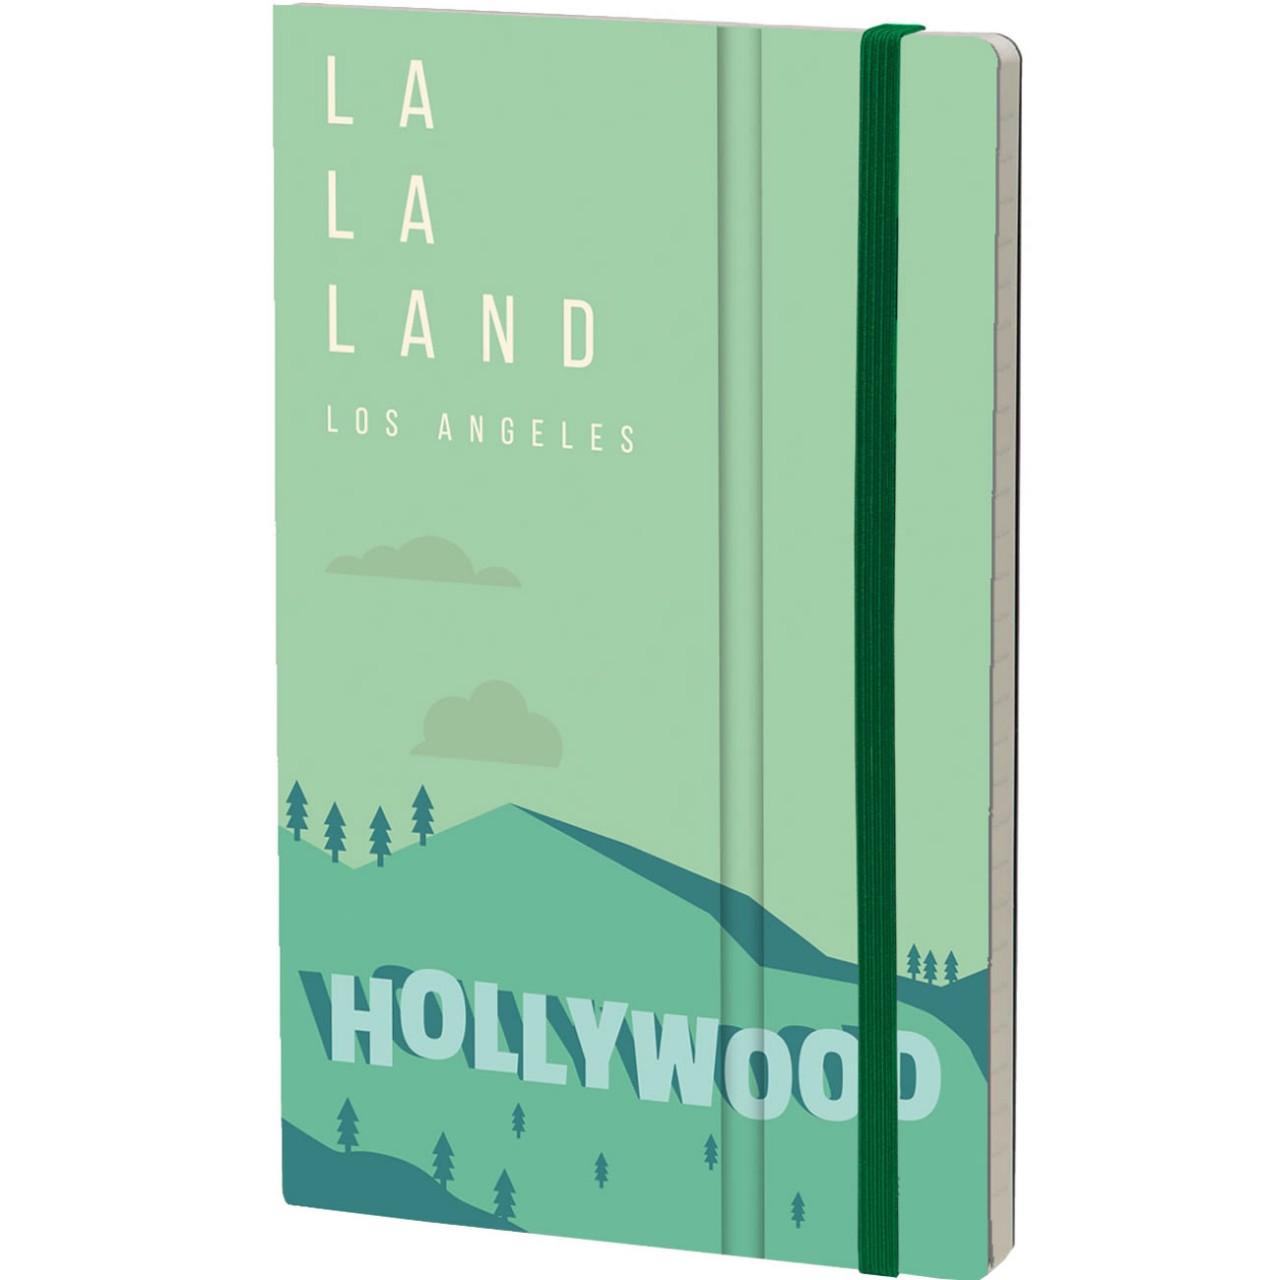 Stifflex Notizbuch ALIAS 13 x 21 cm 192 S., LOS ANGELES